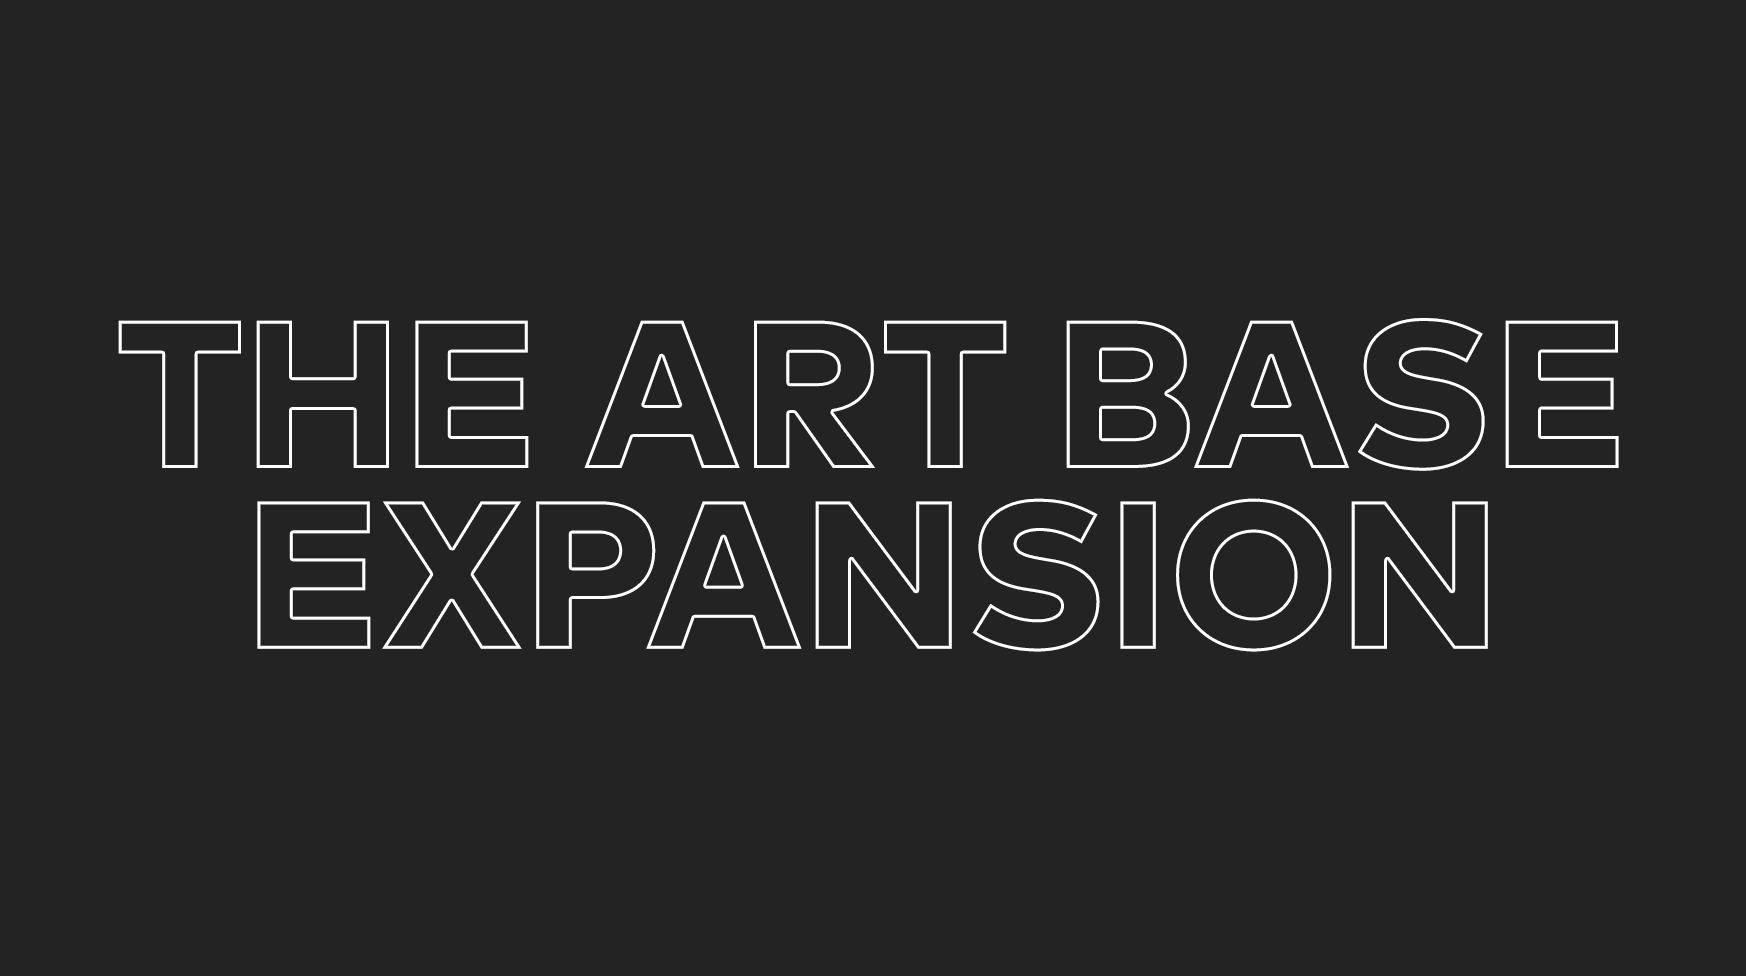 tab-expansion